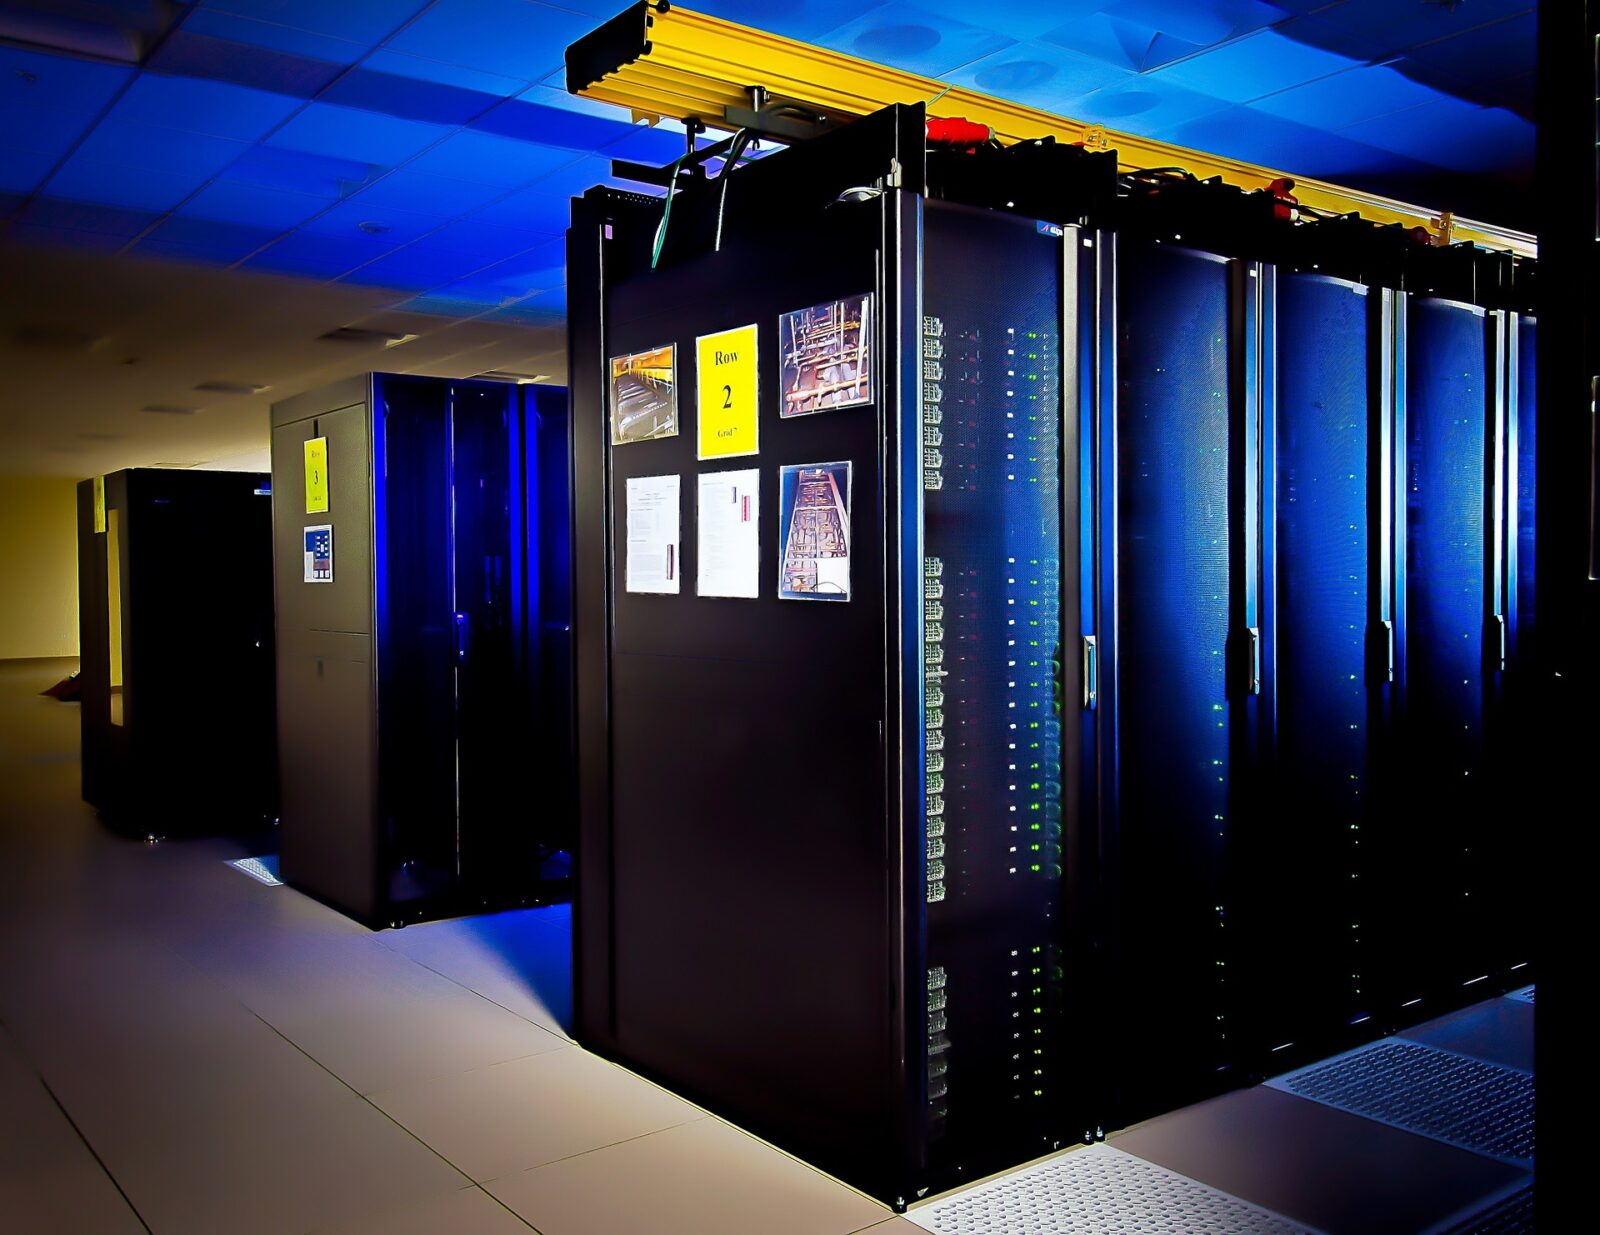 Supercomputador - Toshiba